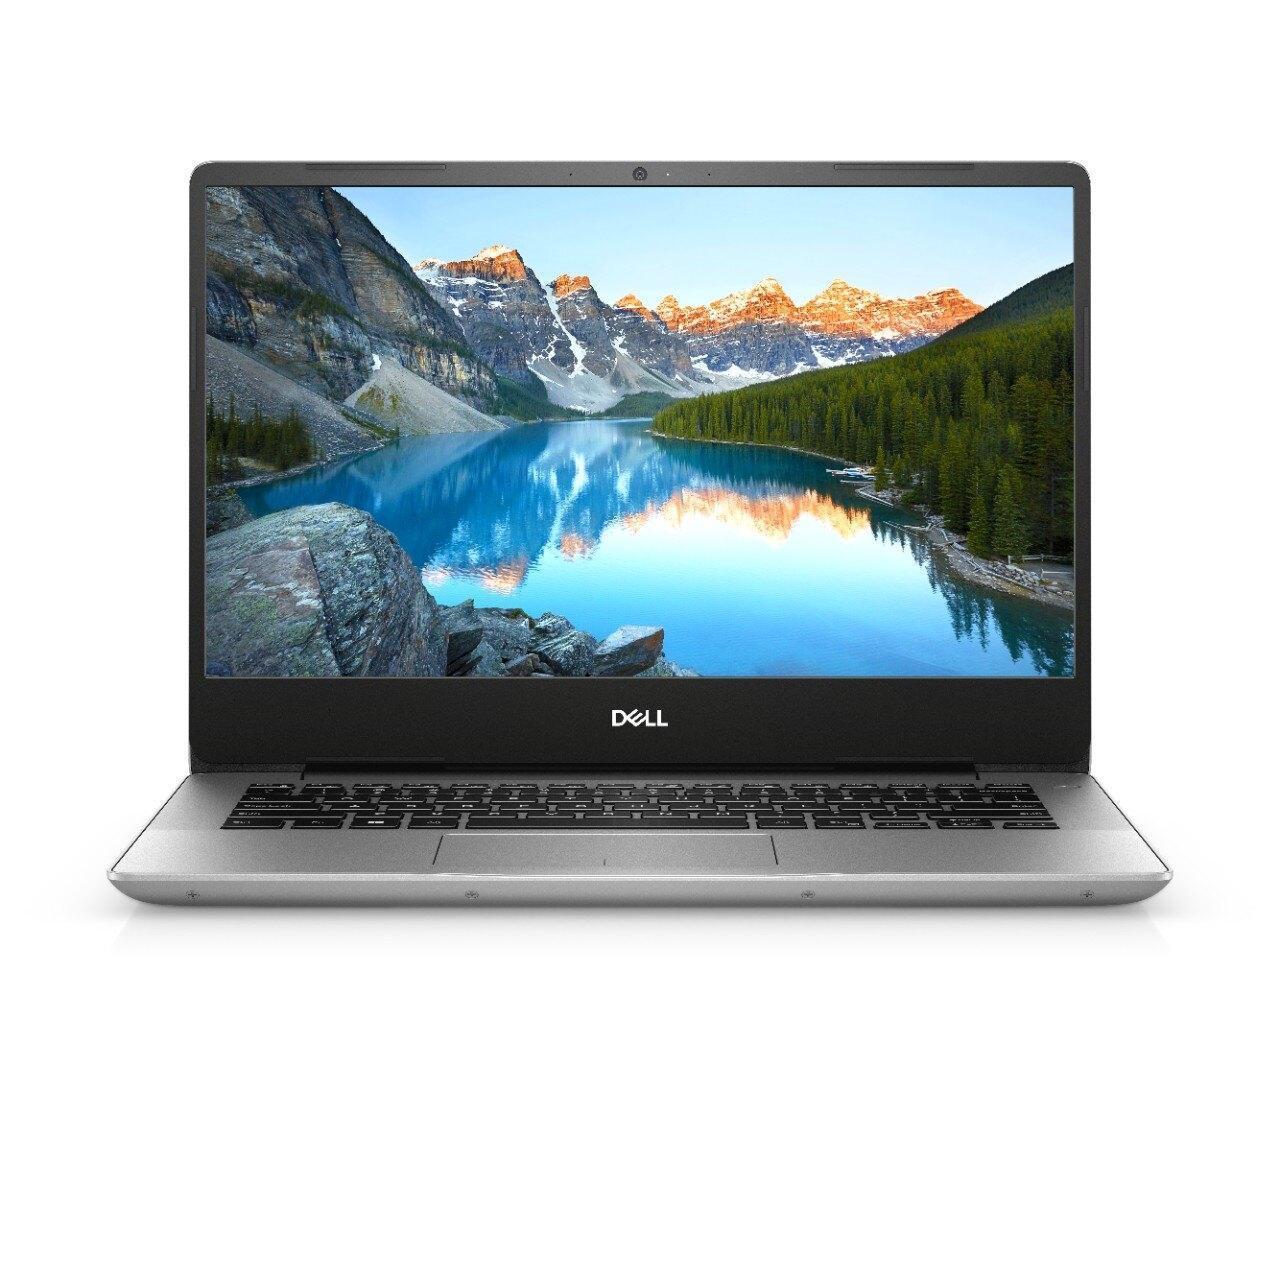 Dell 5480 14-inch () - Intel Core i7 8th Gen. - 8 GB - HDD 1 TB